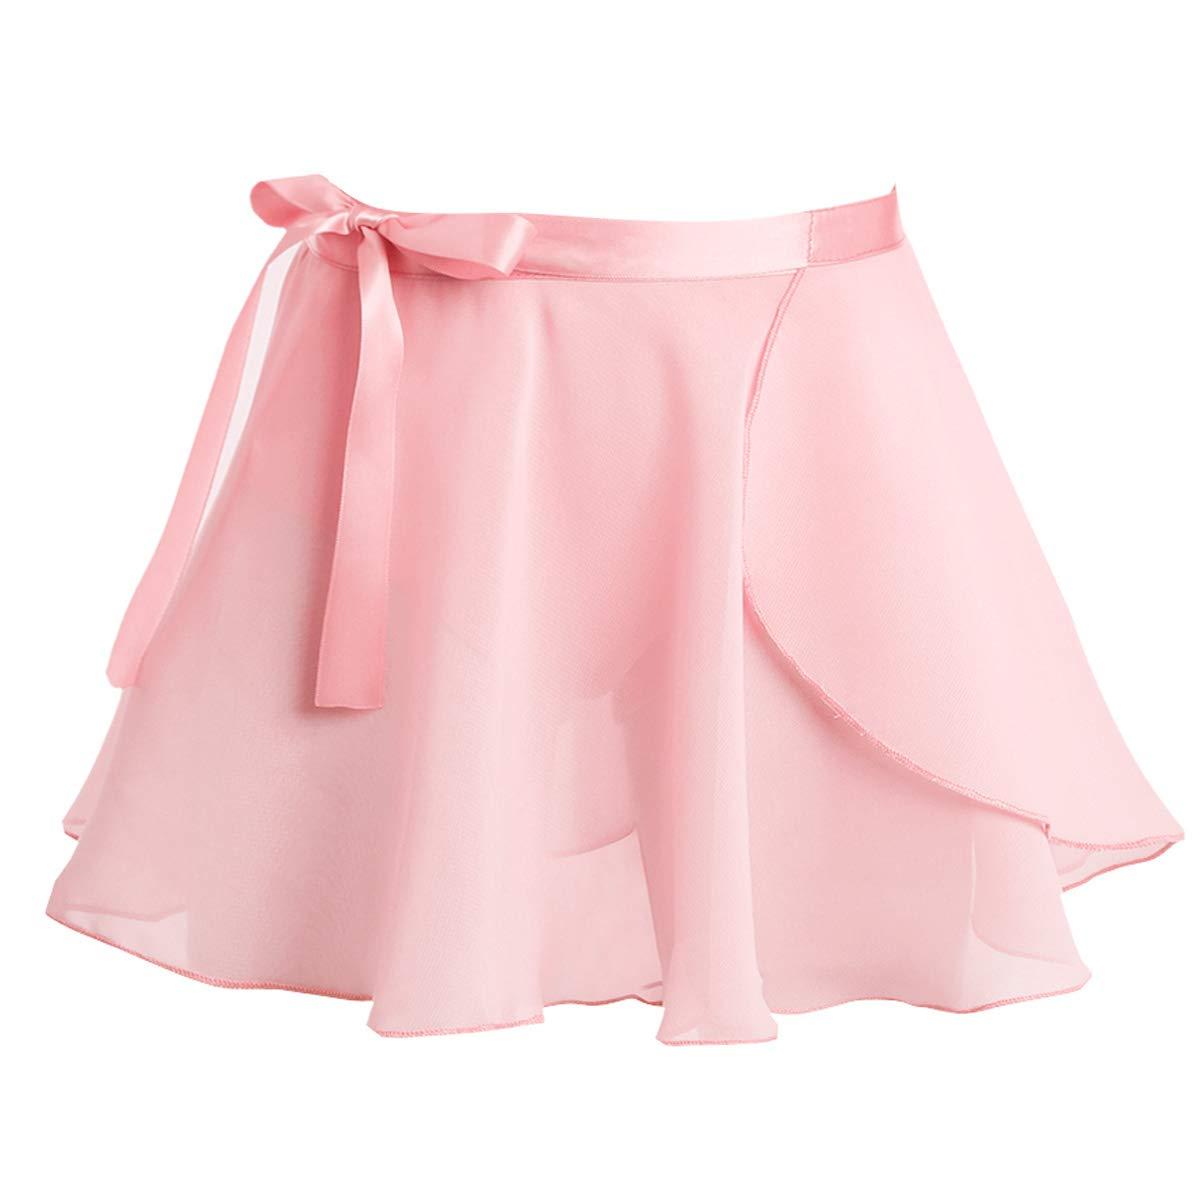 TiaoBug Girls' Ballet Wrap Skirt with Tie Waist Chiffon Basic Wrap Tutu Dancewear Costumes Pink 3-4